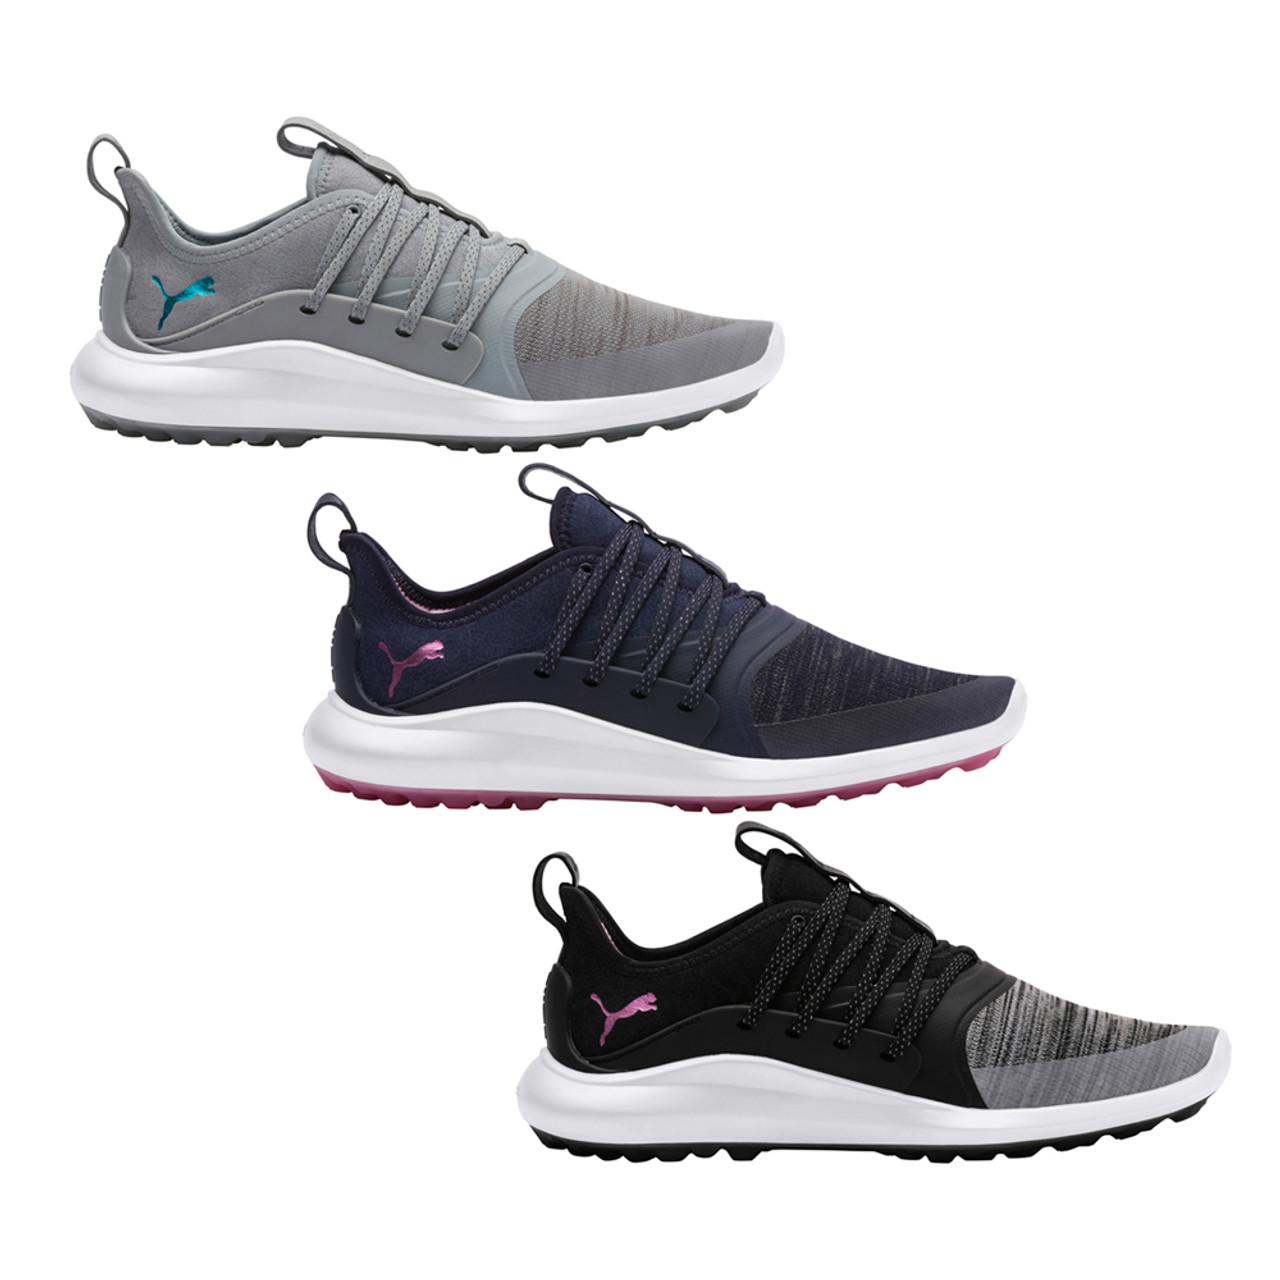 Puma Ignite Nxt Solelace Spikeless Golf Shoes 2019 Women Golfio